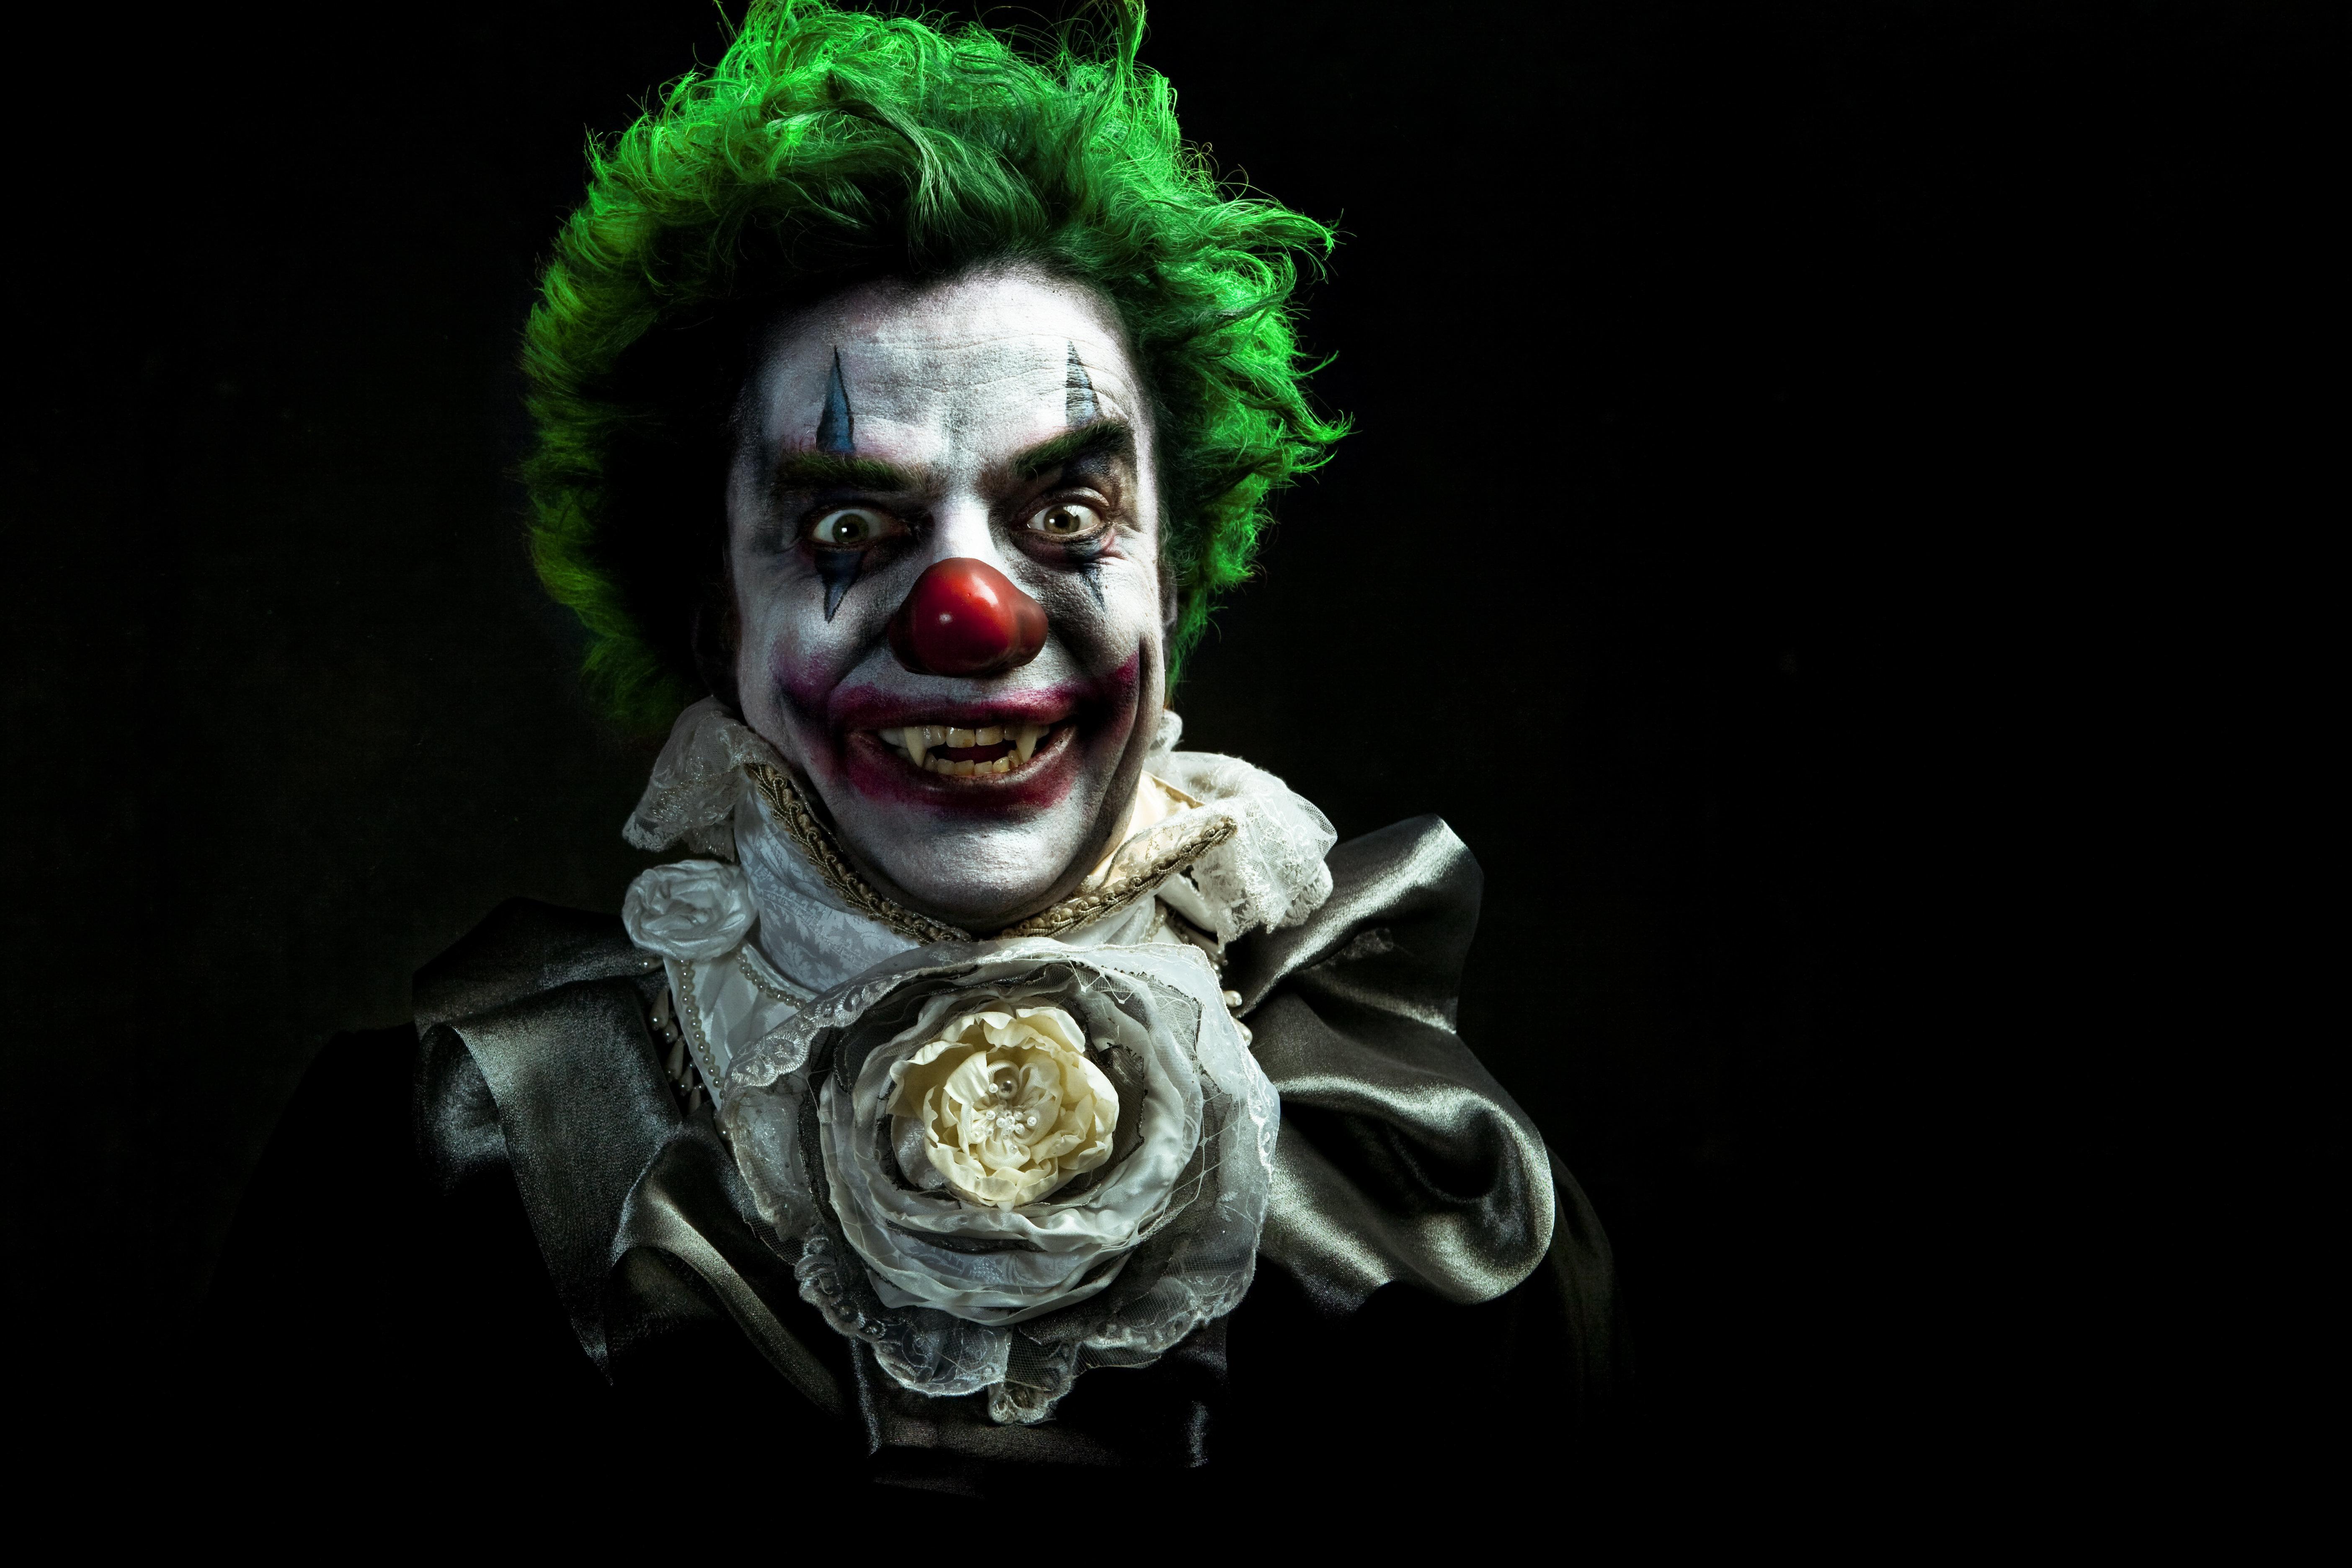 A stock photo of a creepy evil vampire clown against a dark textured background. [url=http://www.istockphoto.com/search/lightbox/10593020#1071a130][IMG]http://www.bellaorastudios.com/banners/new01.jpg[/IMG][/url]